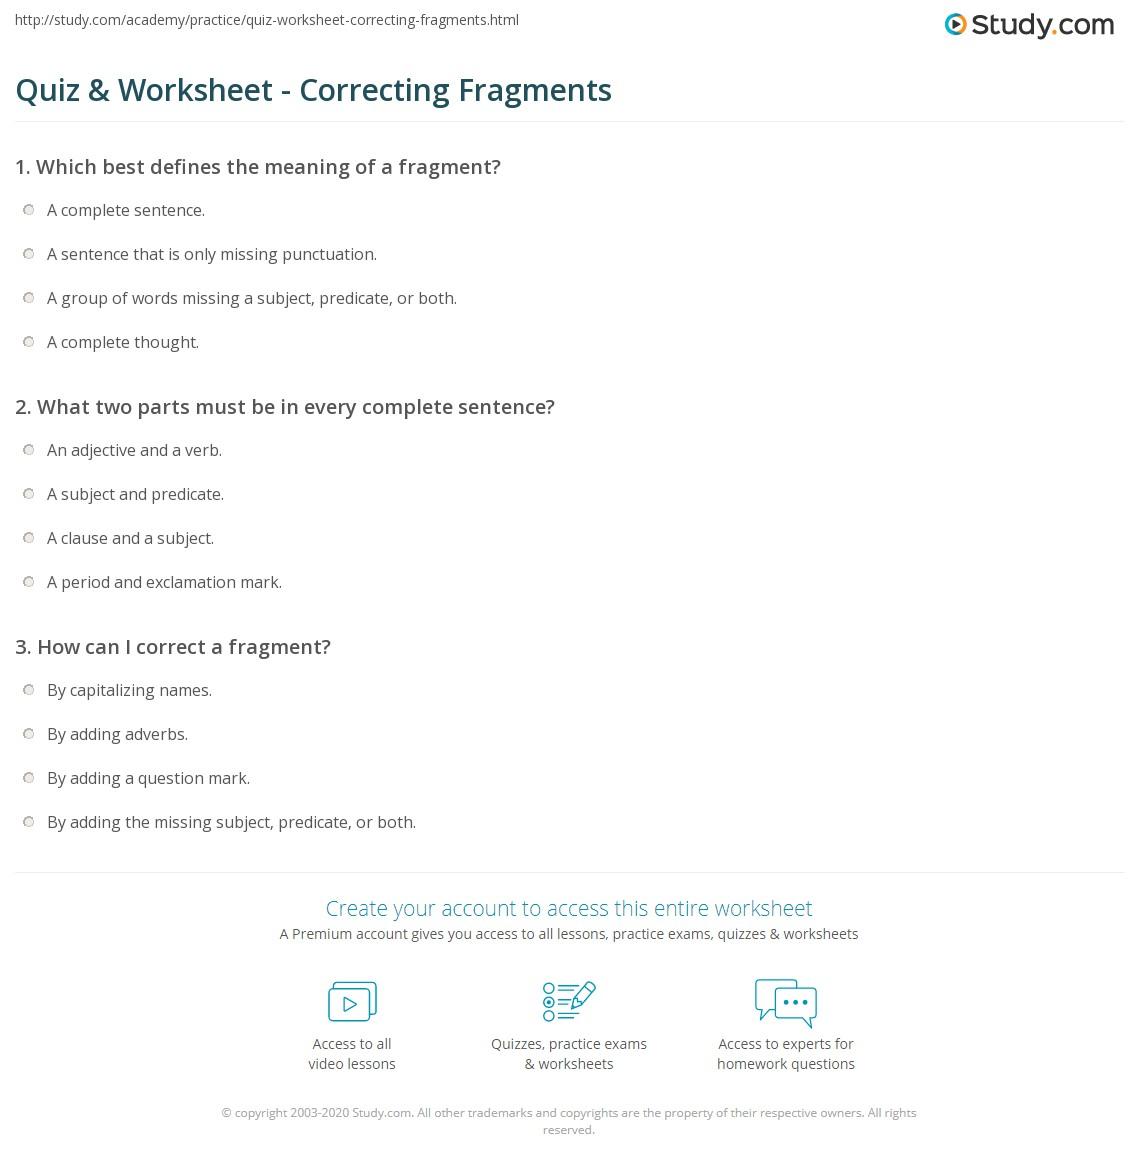 worksheet Fragment Worksheets quiz worksheet correcting fragments study com print how to fix a sentence fragment worksheet